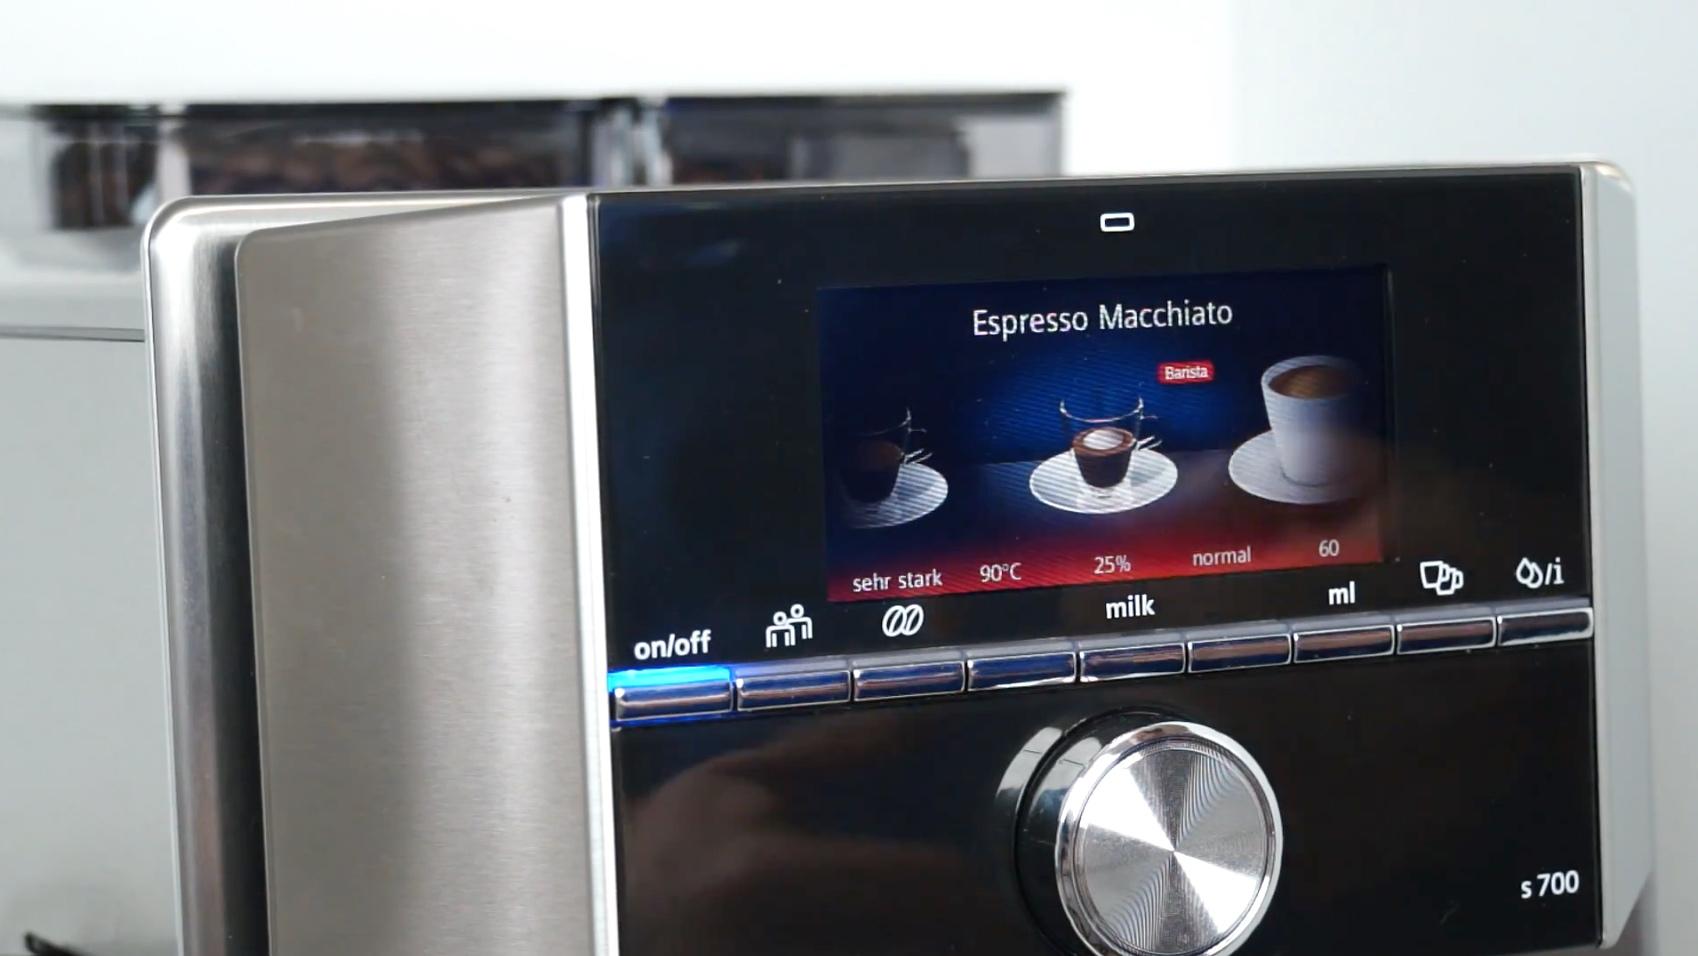 Siemens Kühlschrank Quietscht : Kaffeevollautomat siemens eq s milchsystem reinigen u a franks